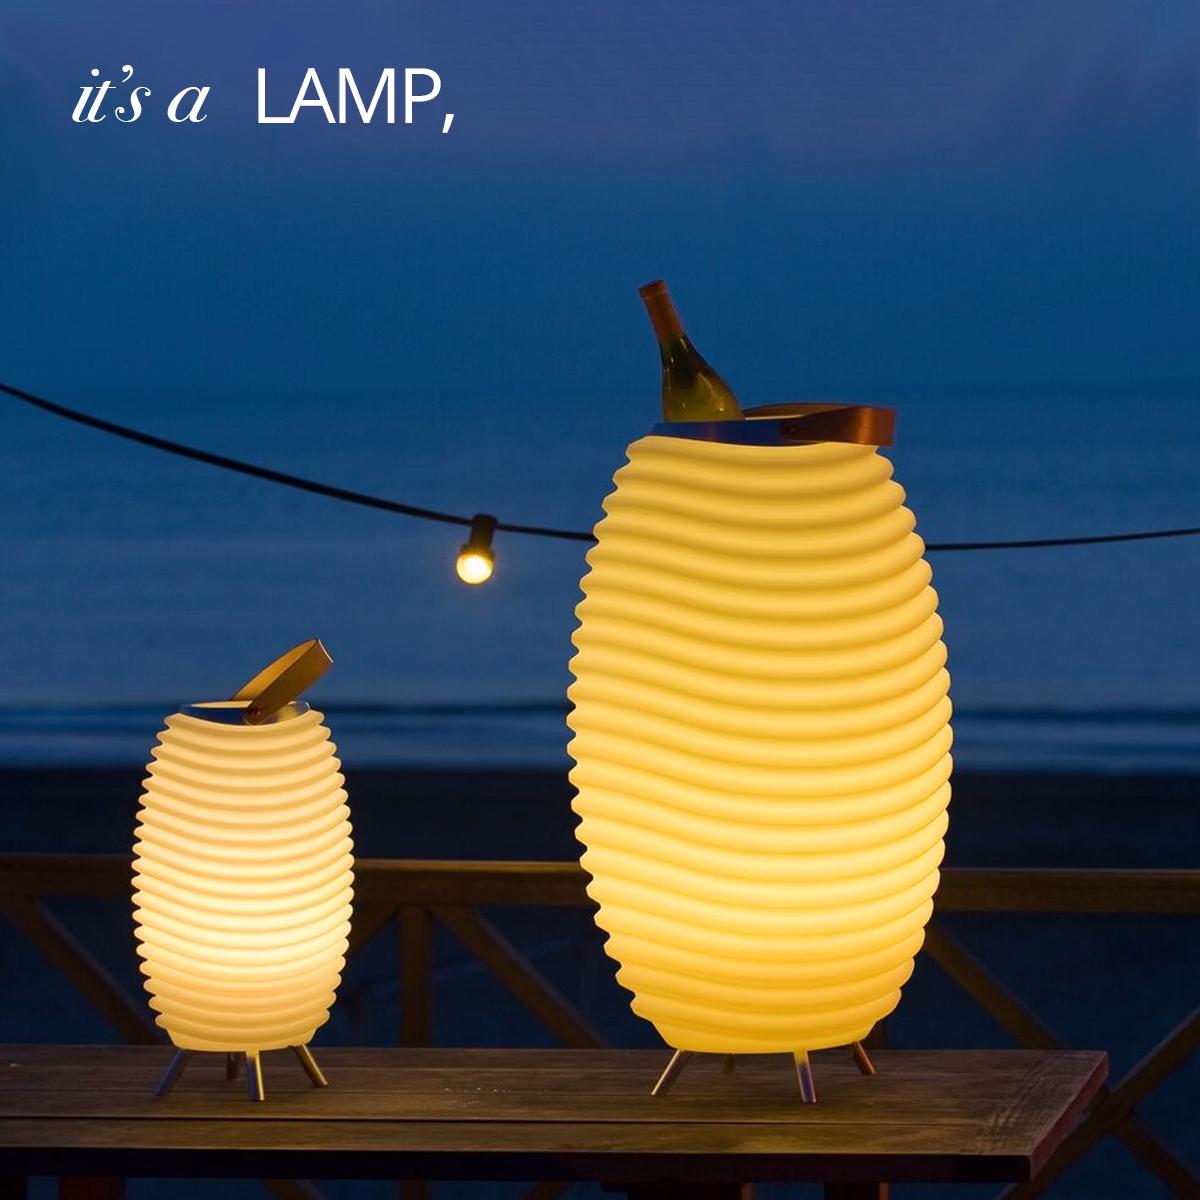 Synergy 35 Outdoor Lamp Speaker Video Video In 2020 Outdoor Lamp Modern Outdoor Lamp Lamp